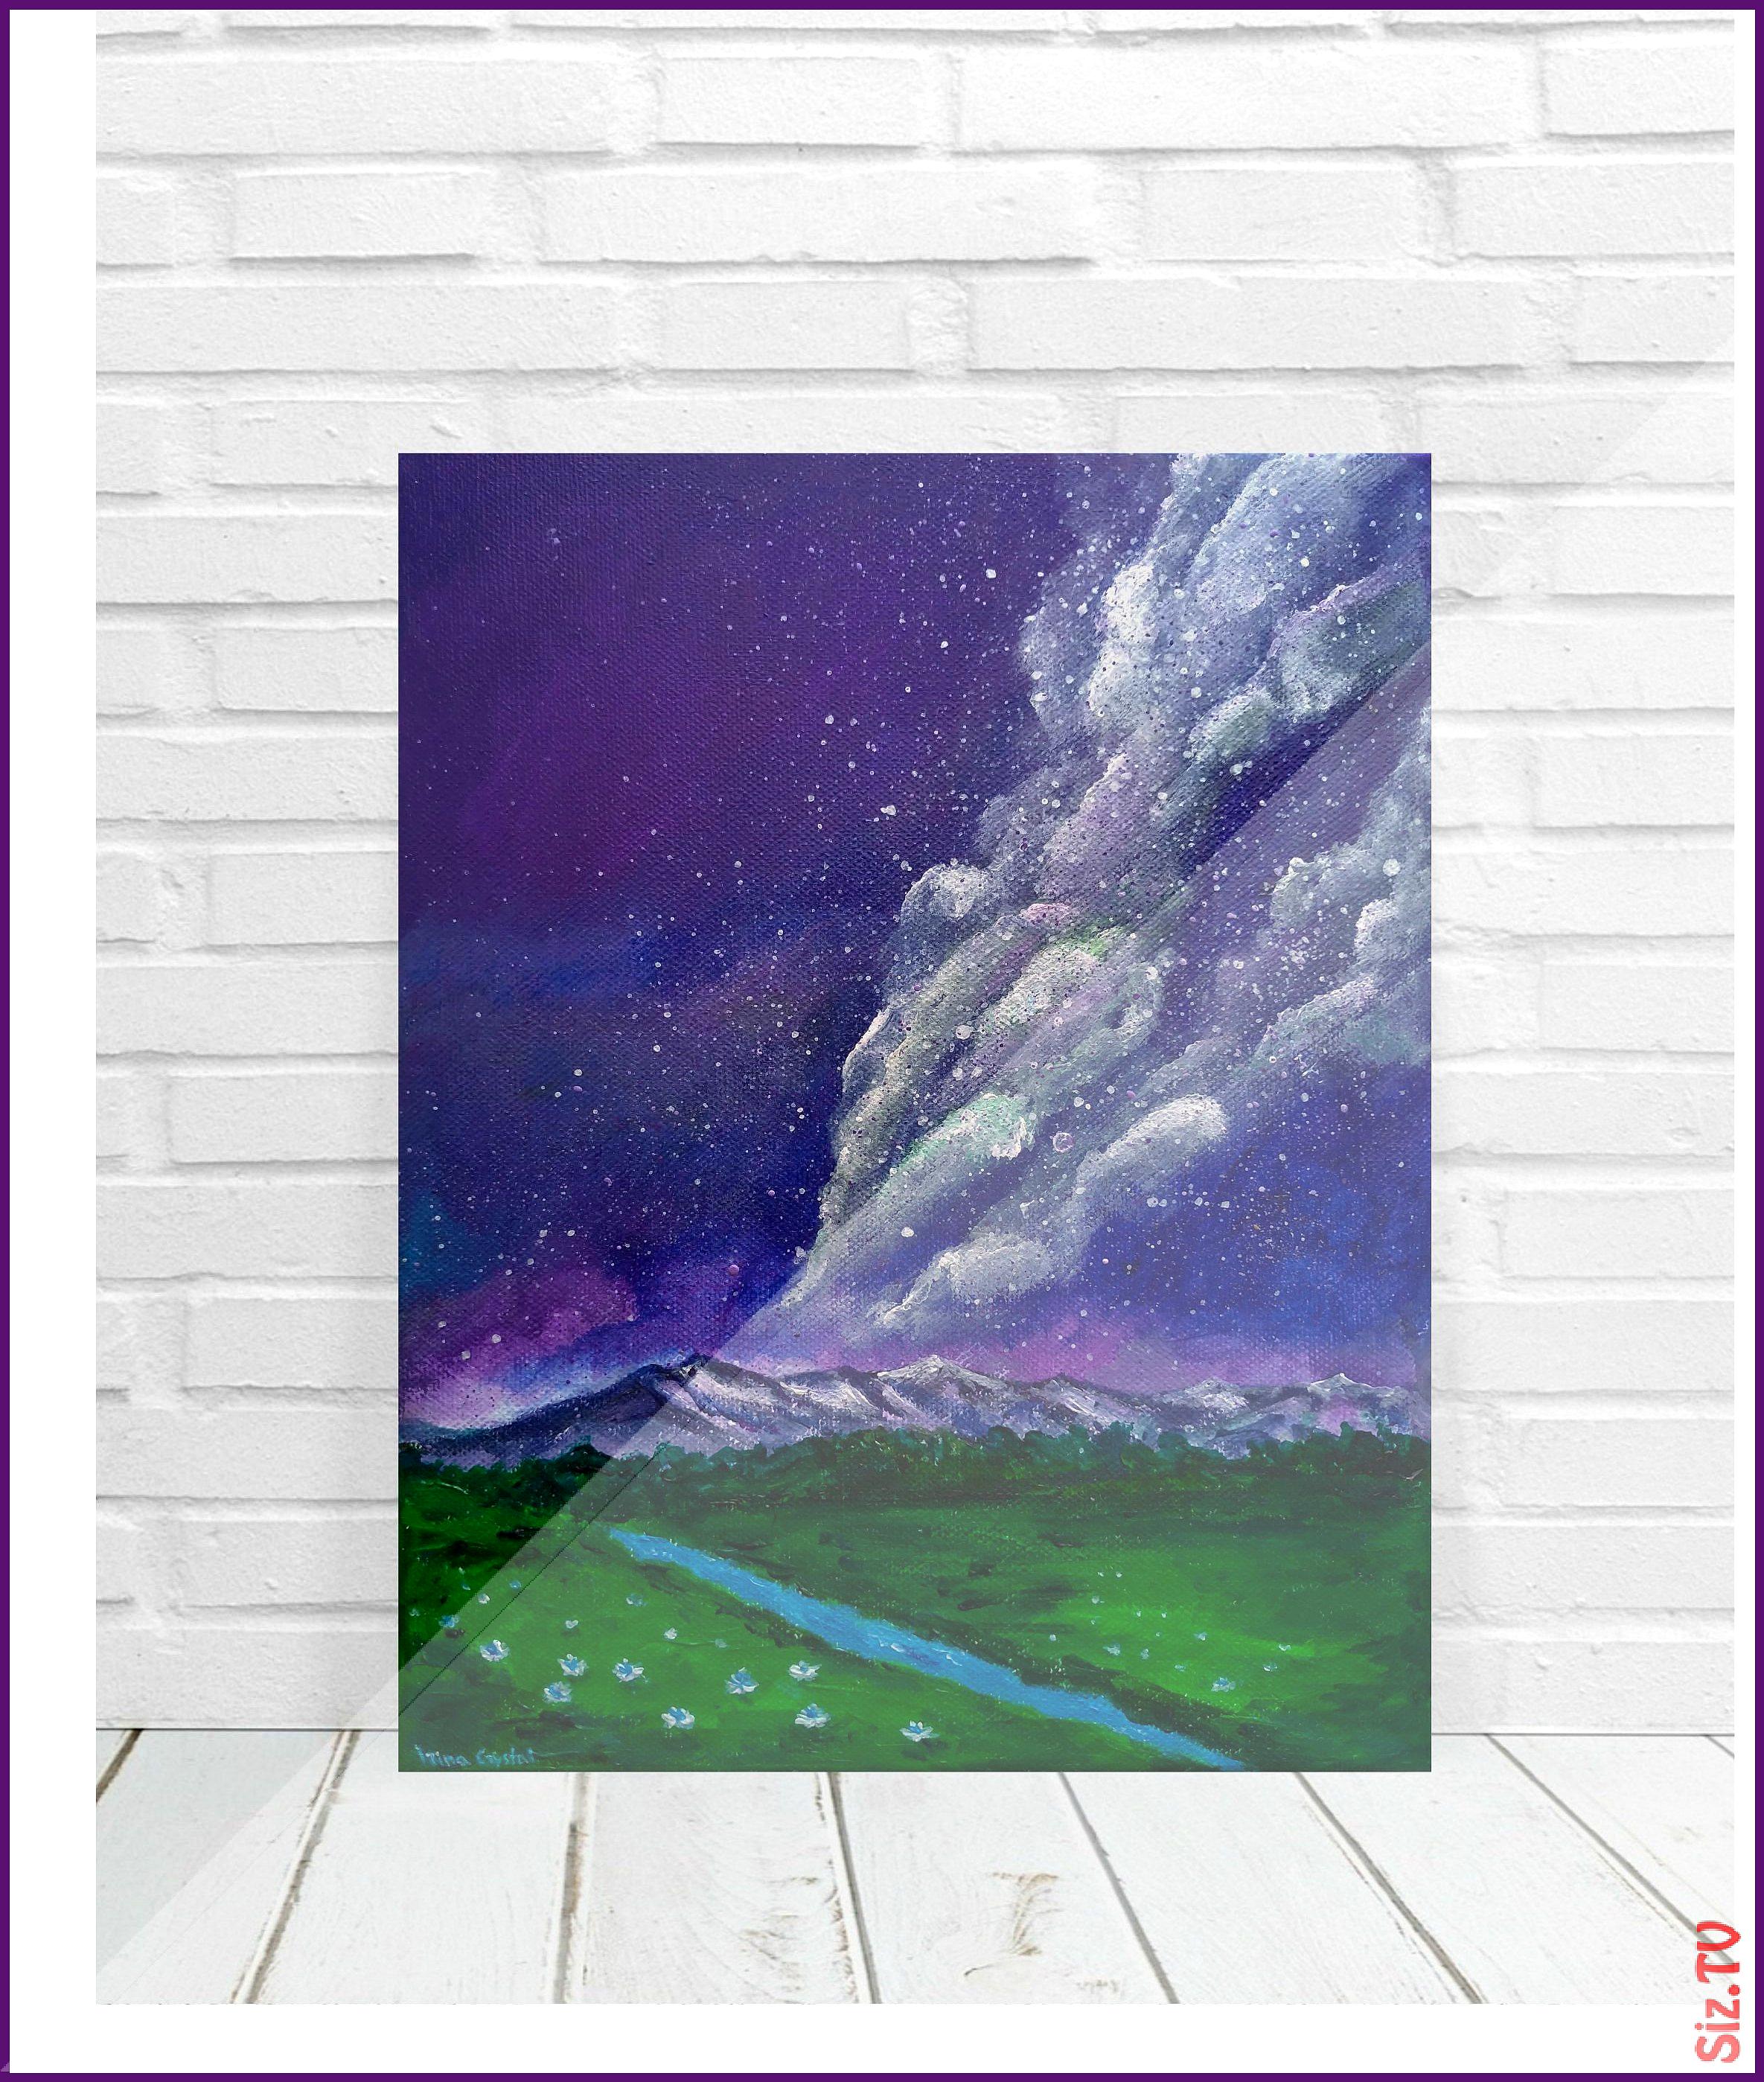 Mountain Painting Original Art Mountain Landscape Original Painting Starry Sky Wildflowers Milky Way Night Sk Nature Paintings Mountain Paintings Adventure Art